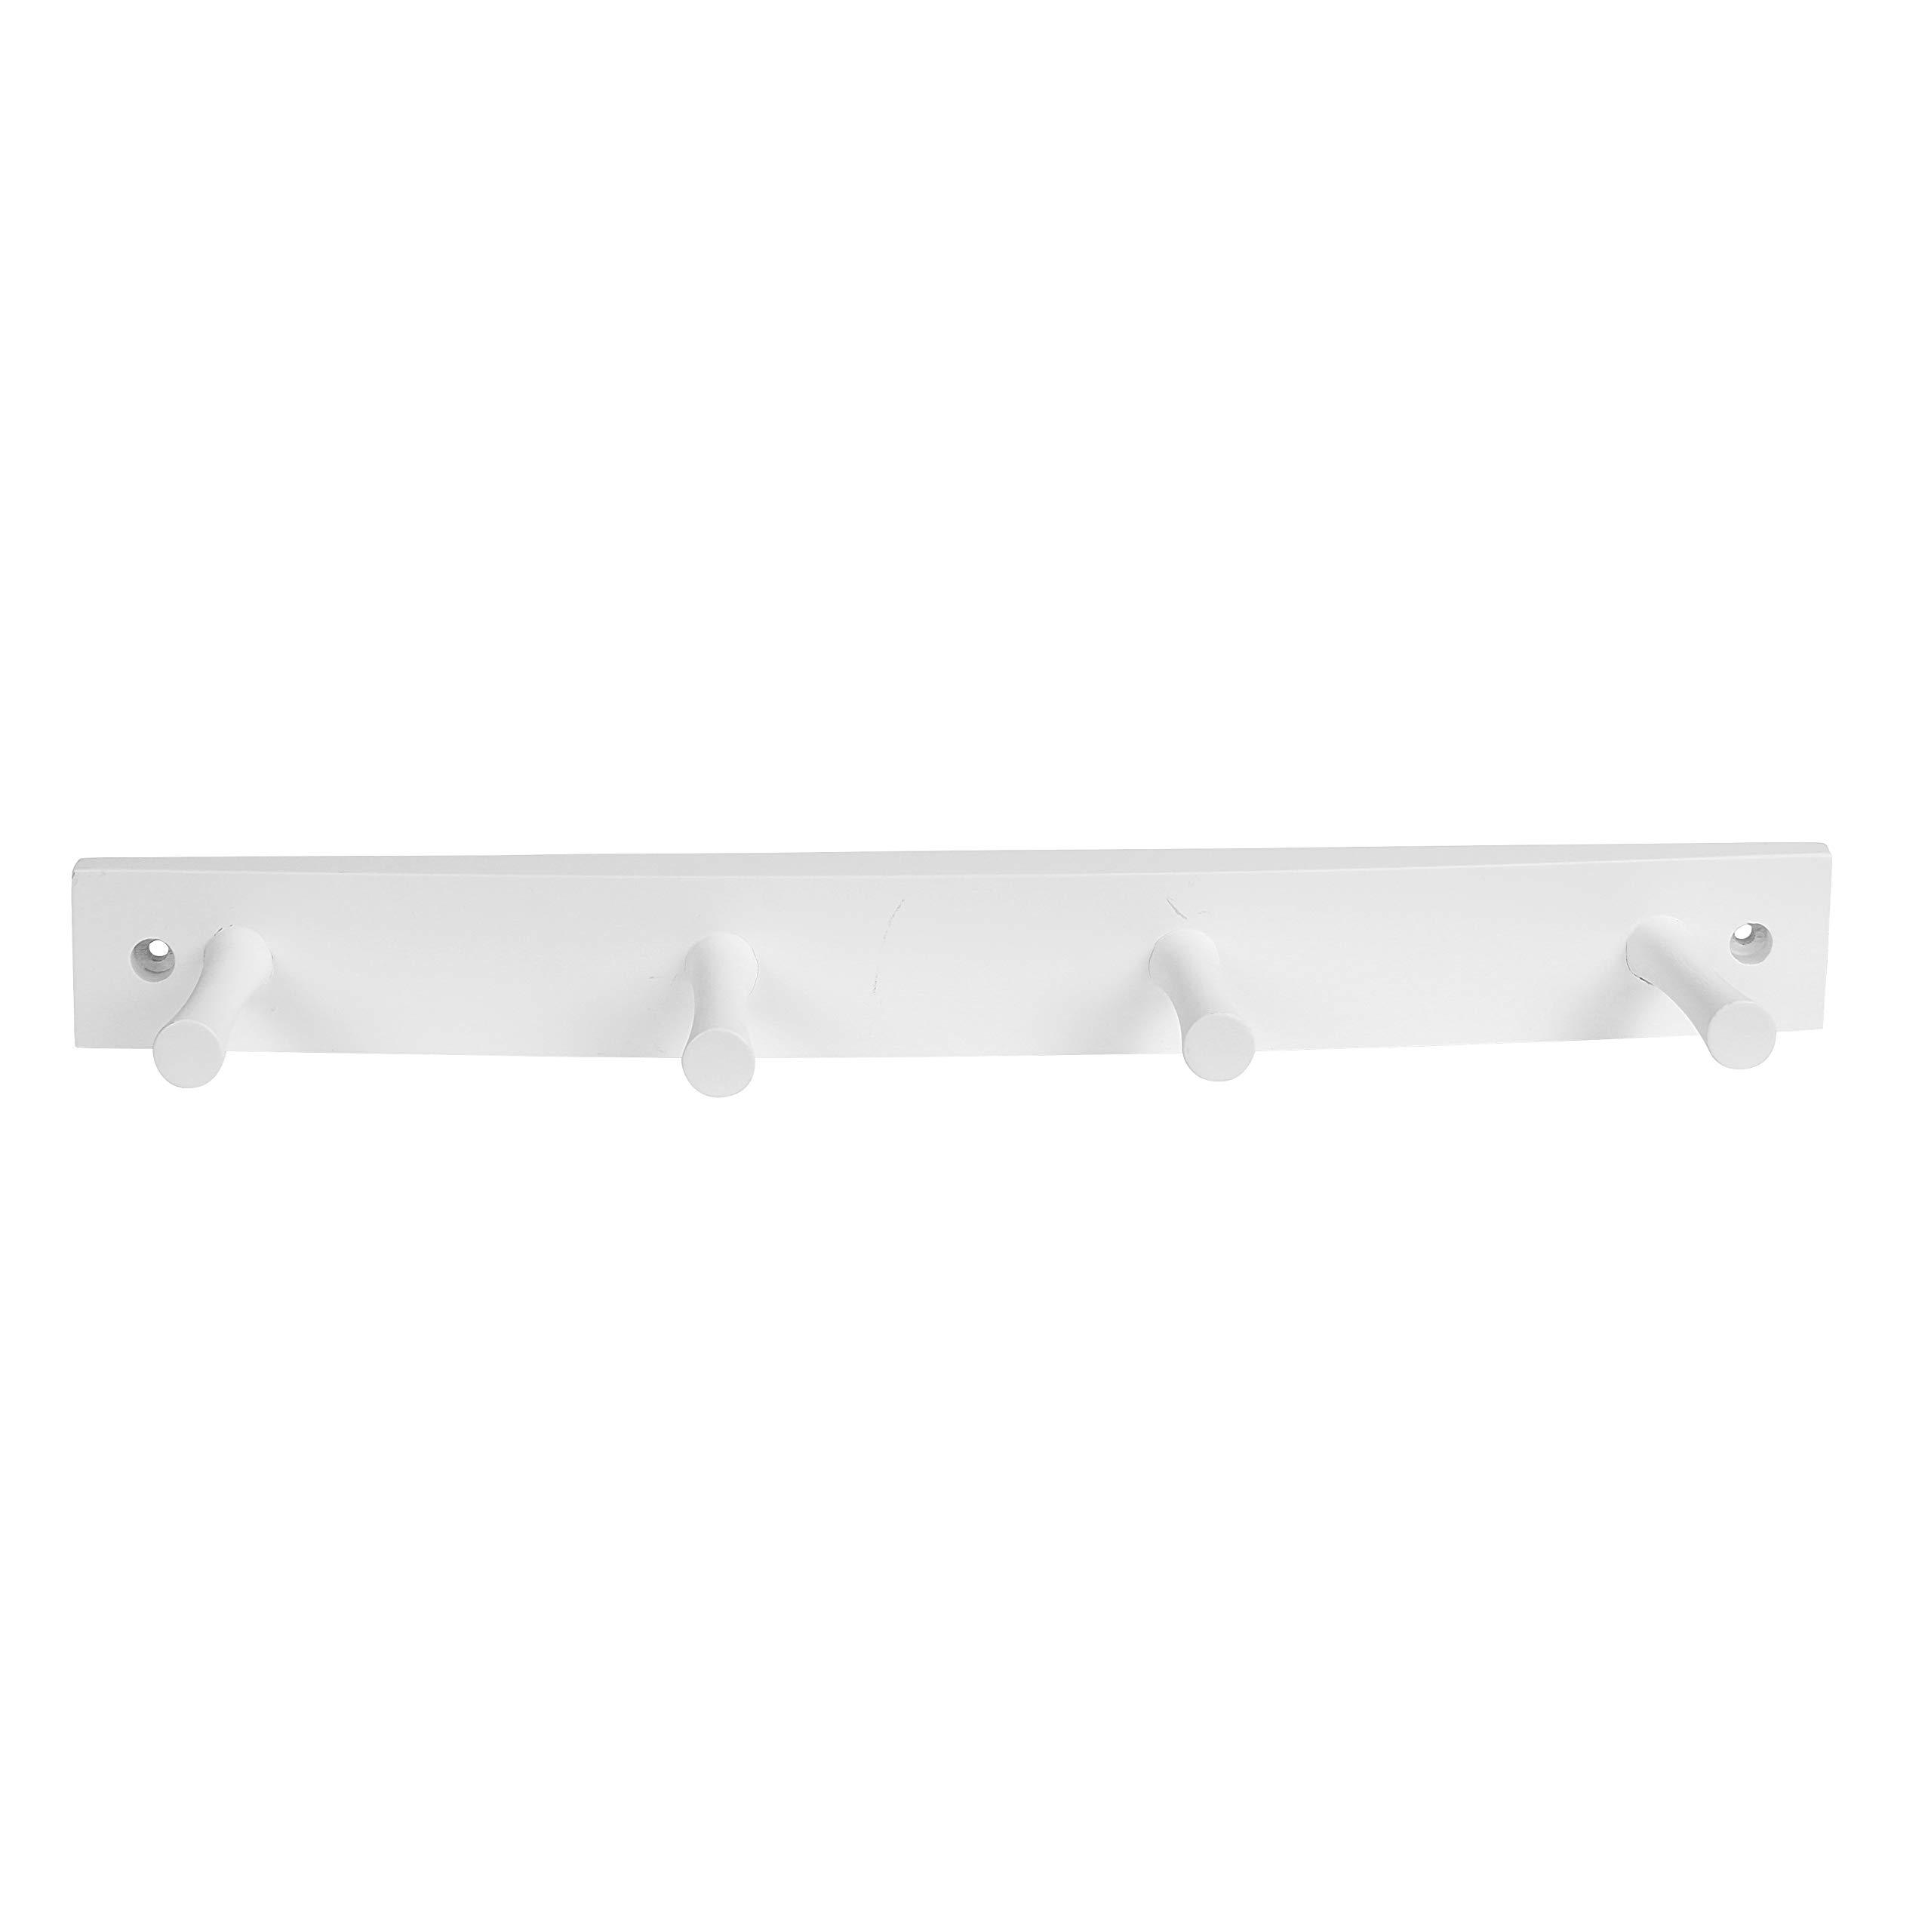 Spectrum Diversified Wood Hook Rack, 4 Peg, White